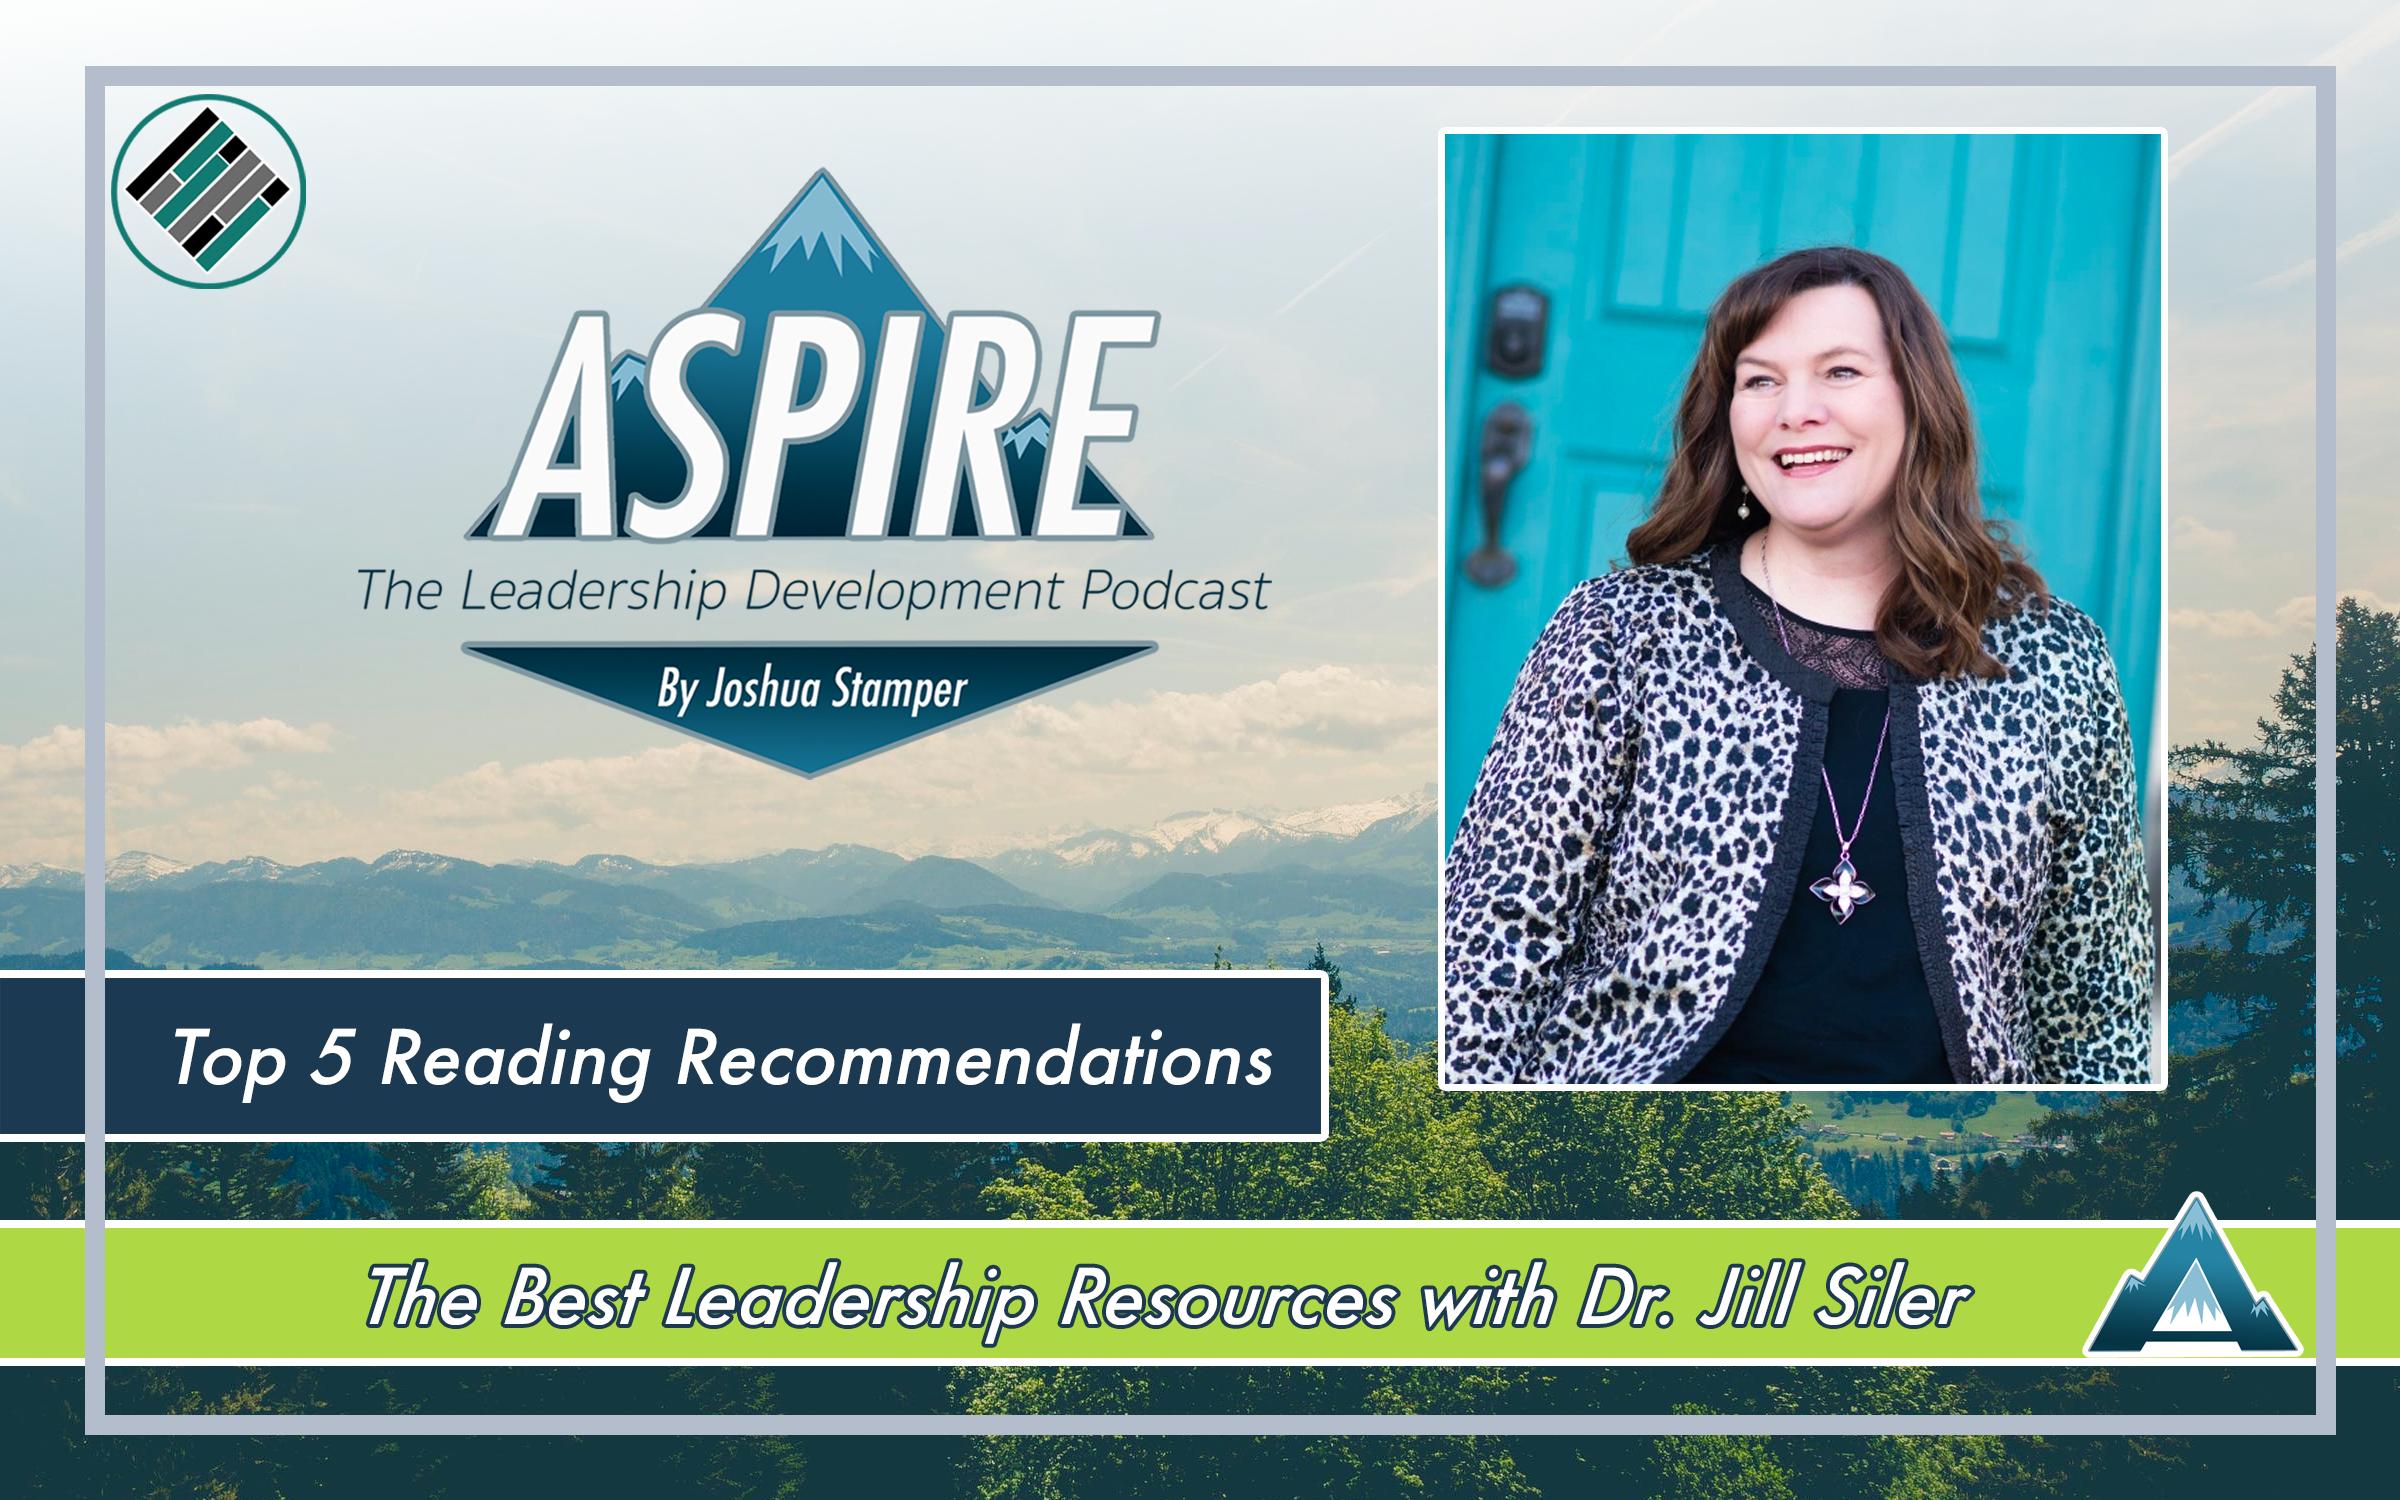 Joshua Stamper, Jill Siler, Aspire: The Leadership Development Podcast, Teach Better